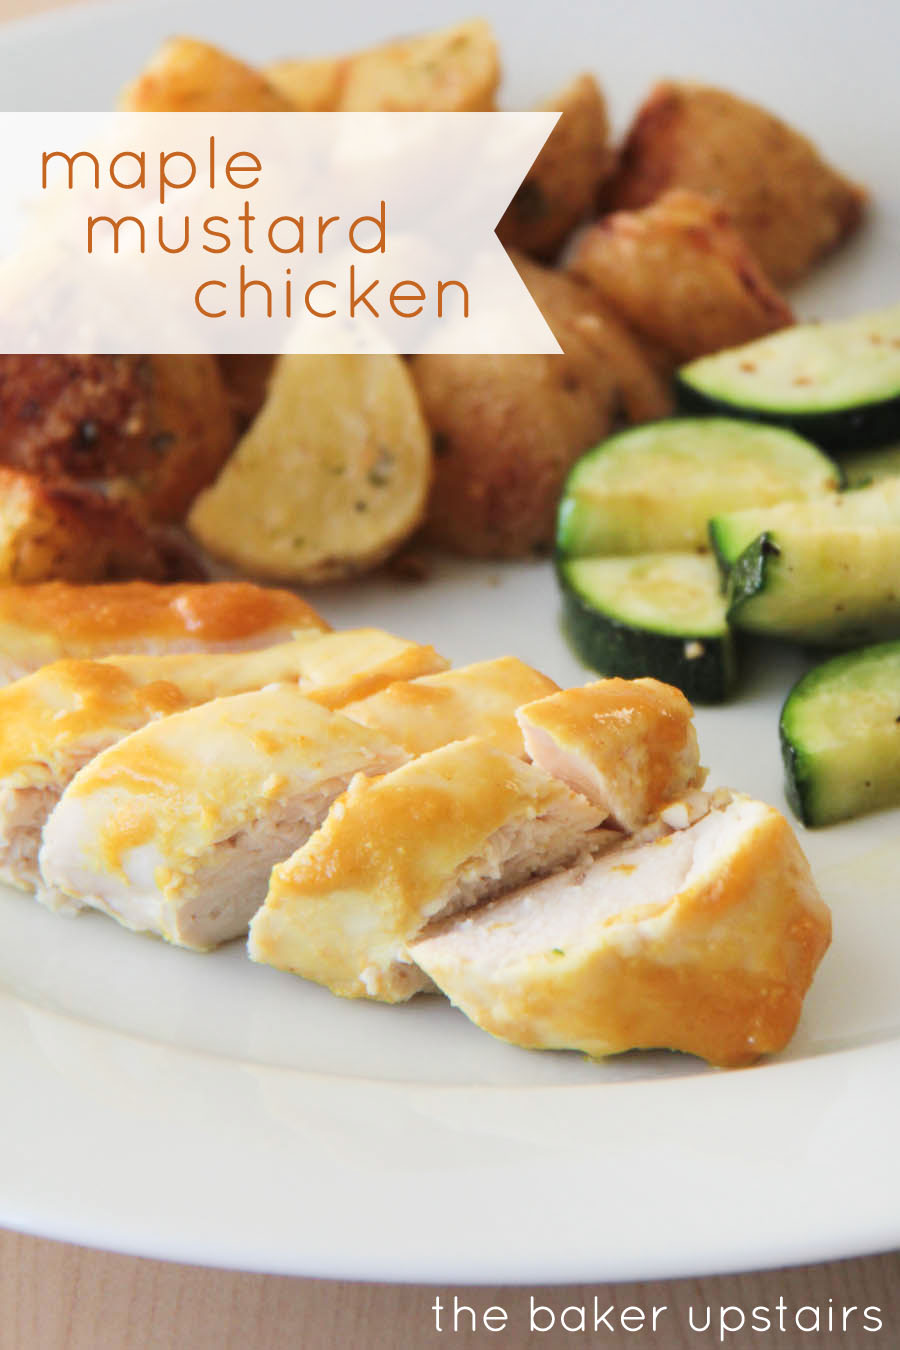 the baker upstairs: maple mustard chicken